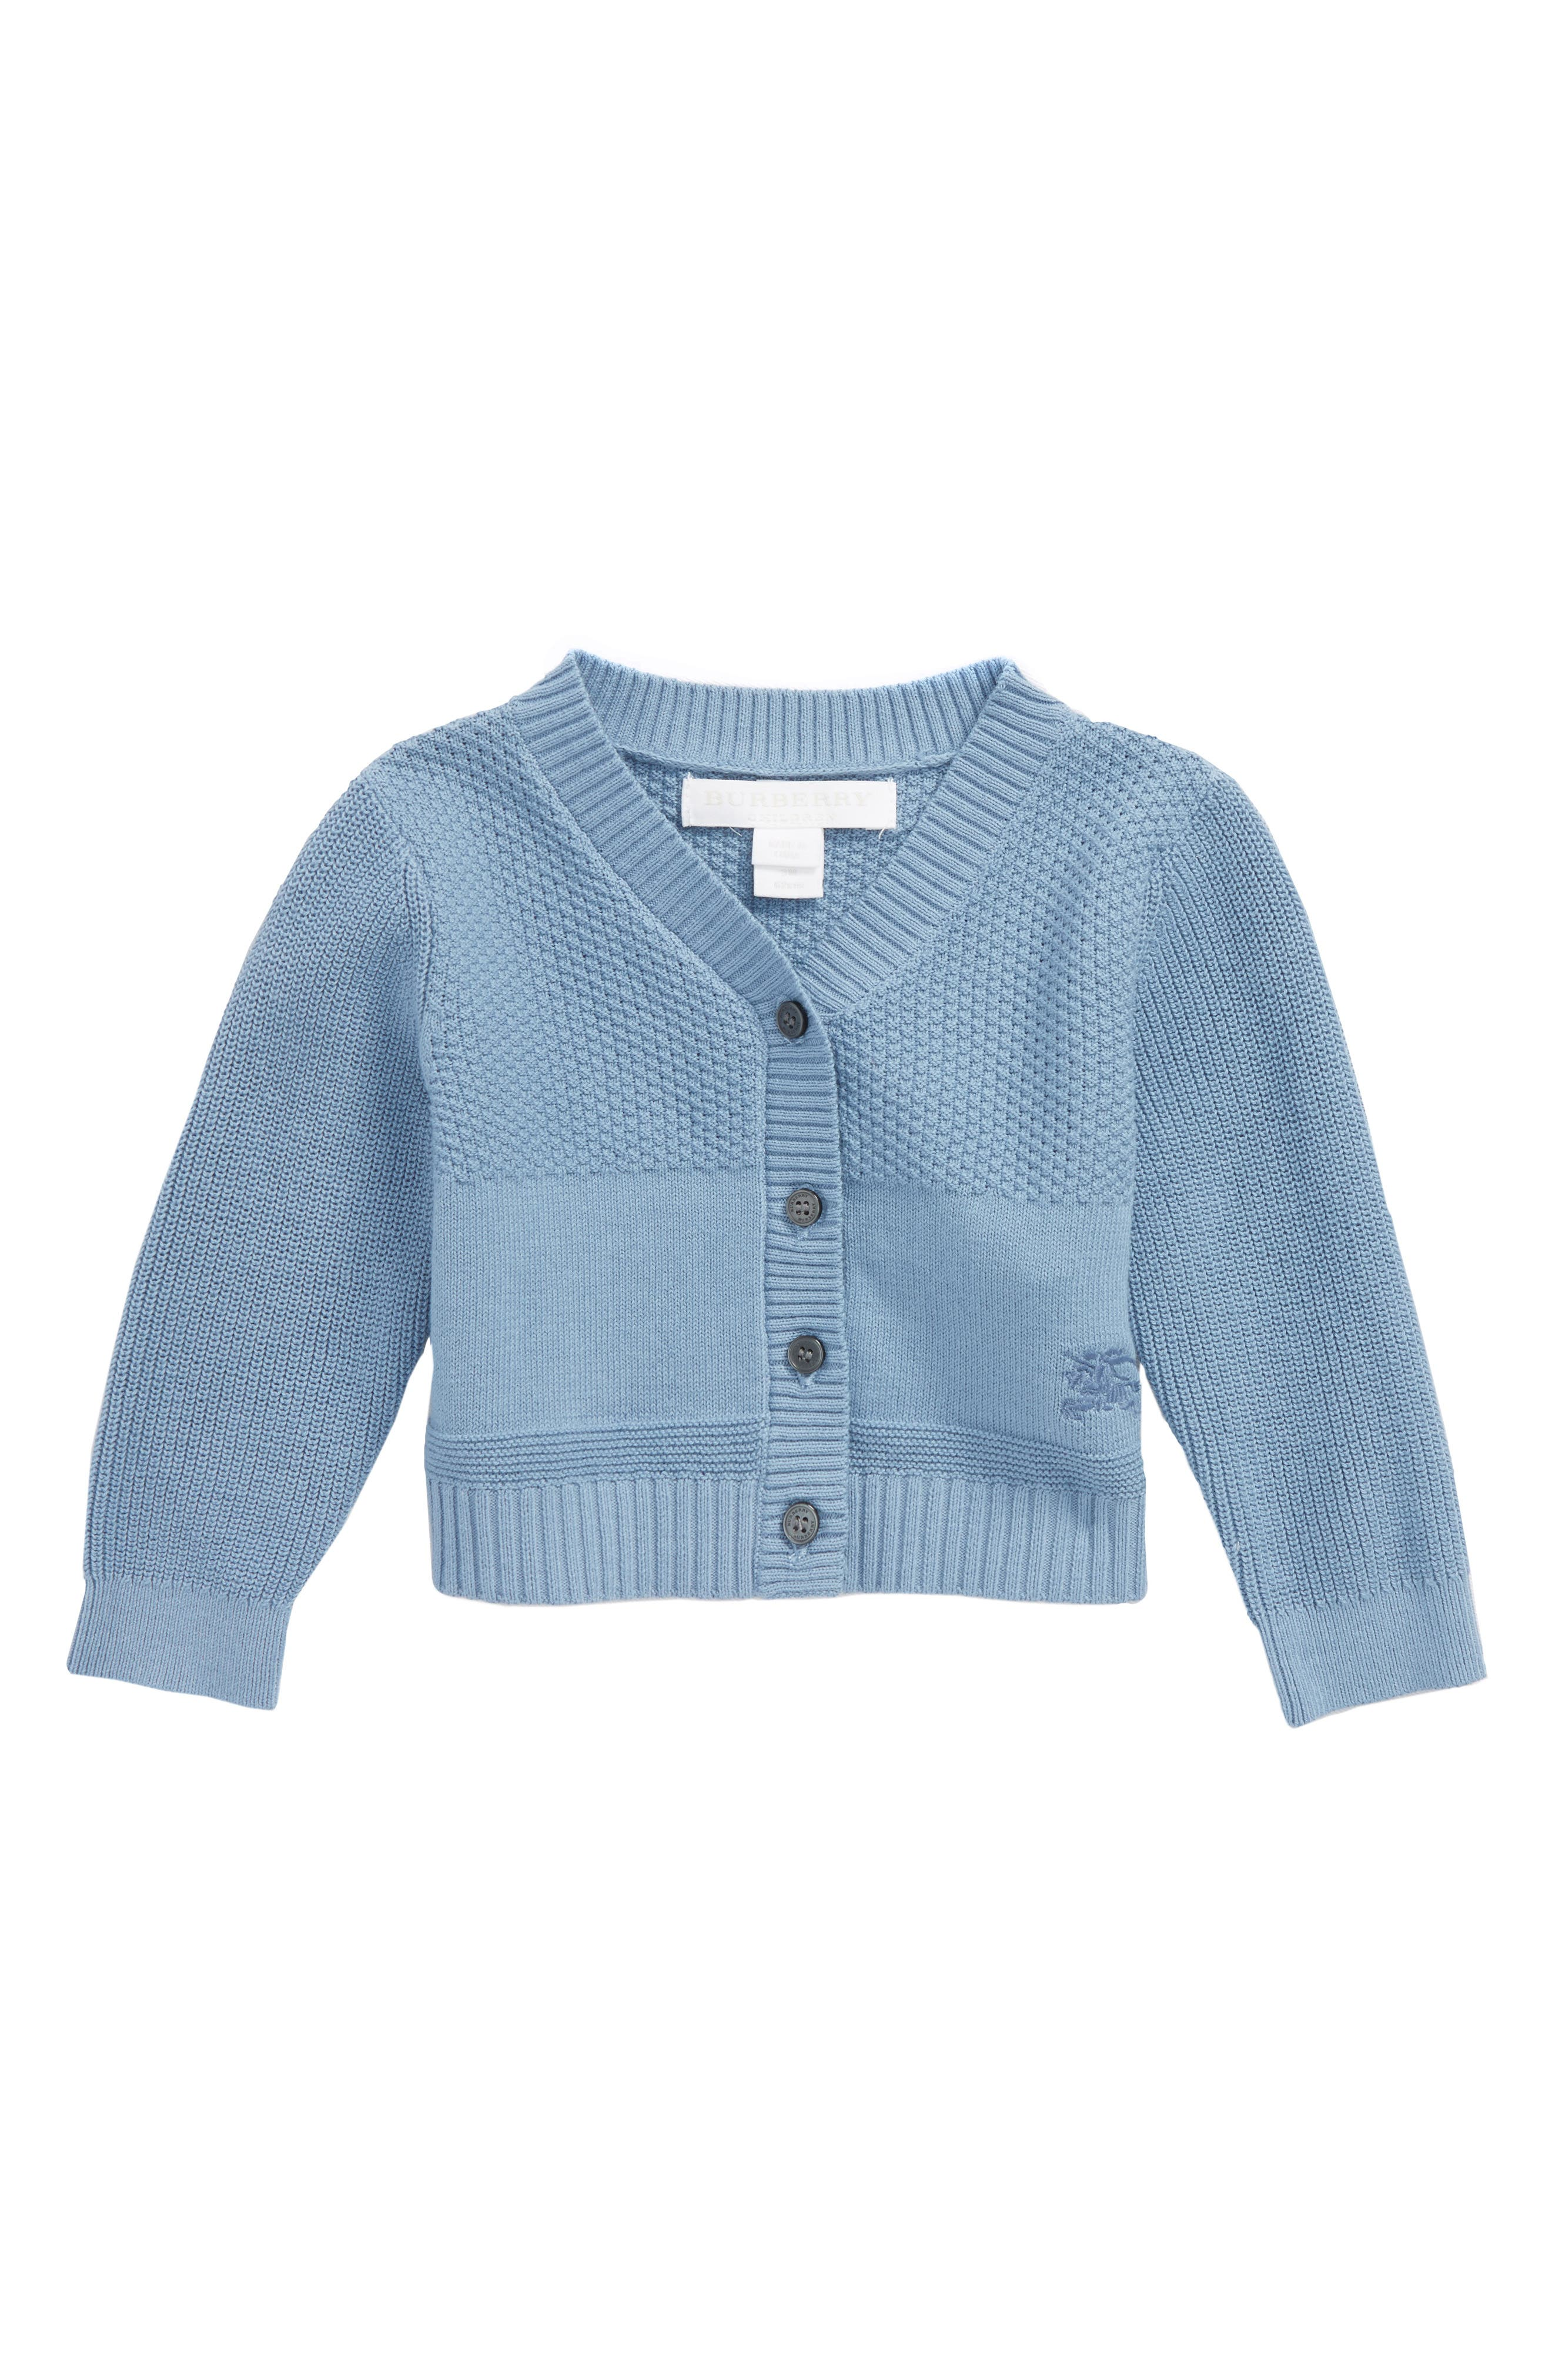 Francis Sweater Cardigan,                             Main thumbnail 1, color,                             Chalk Blue